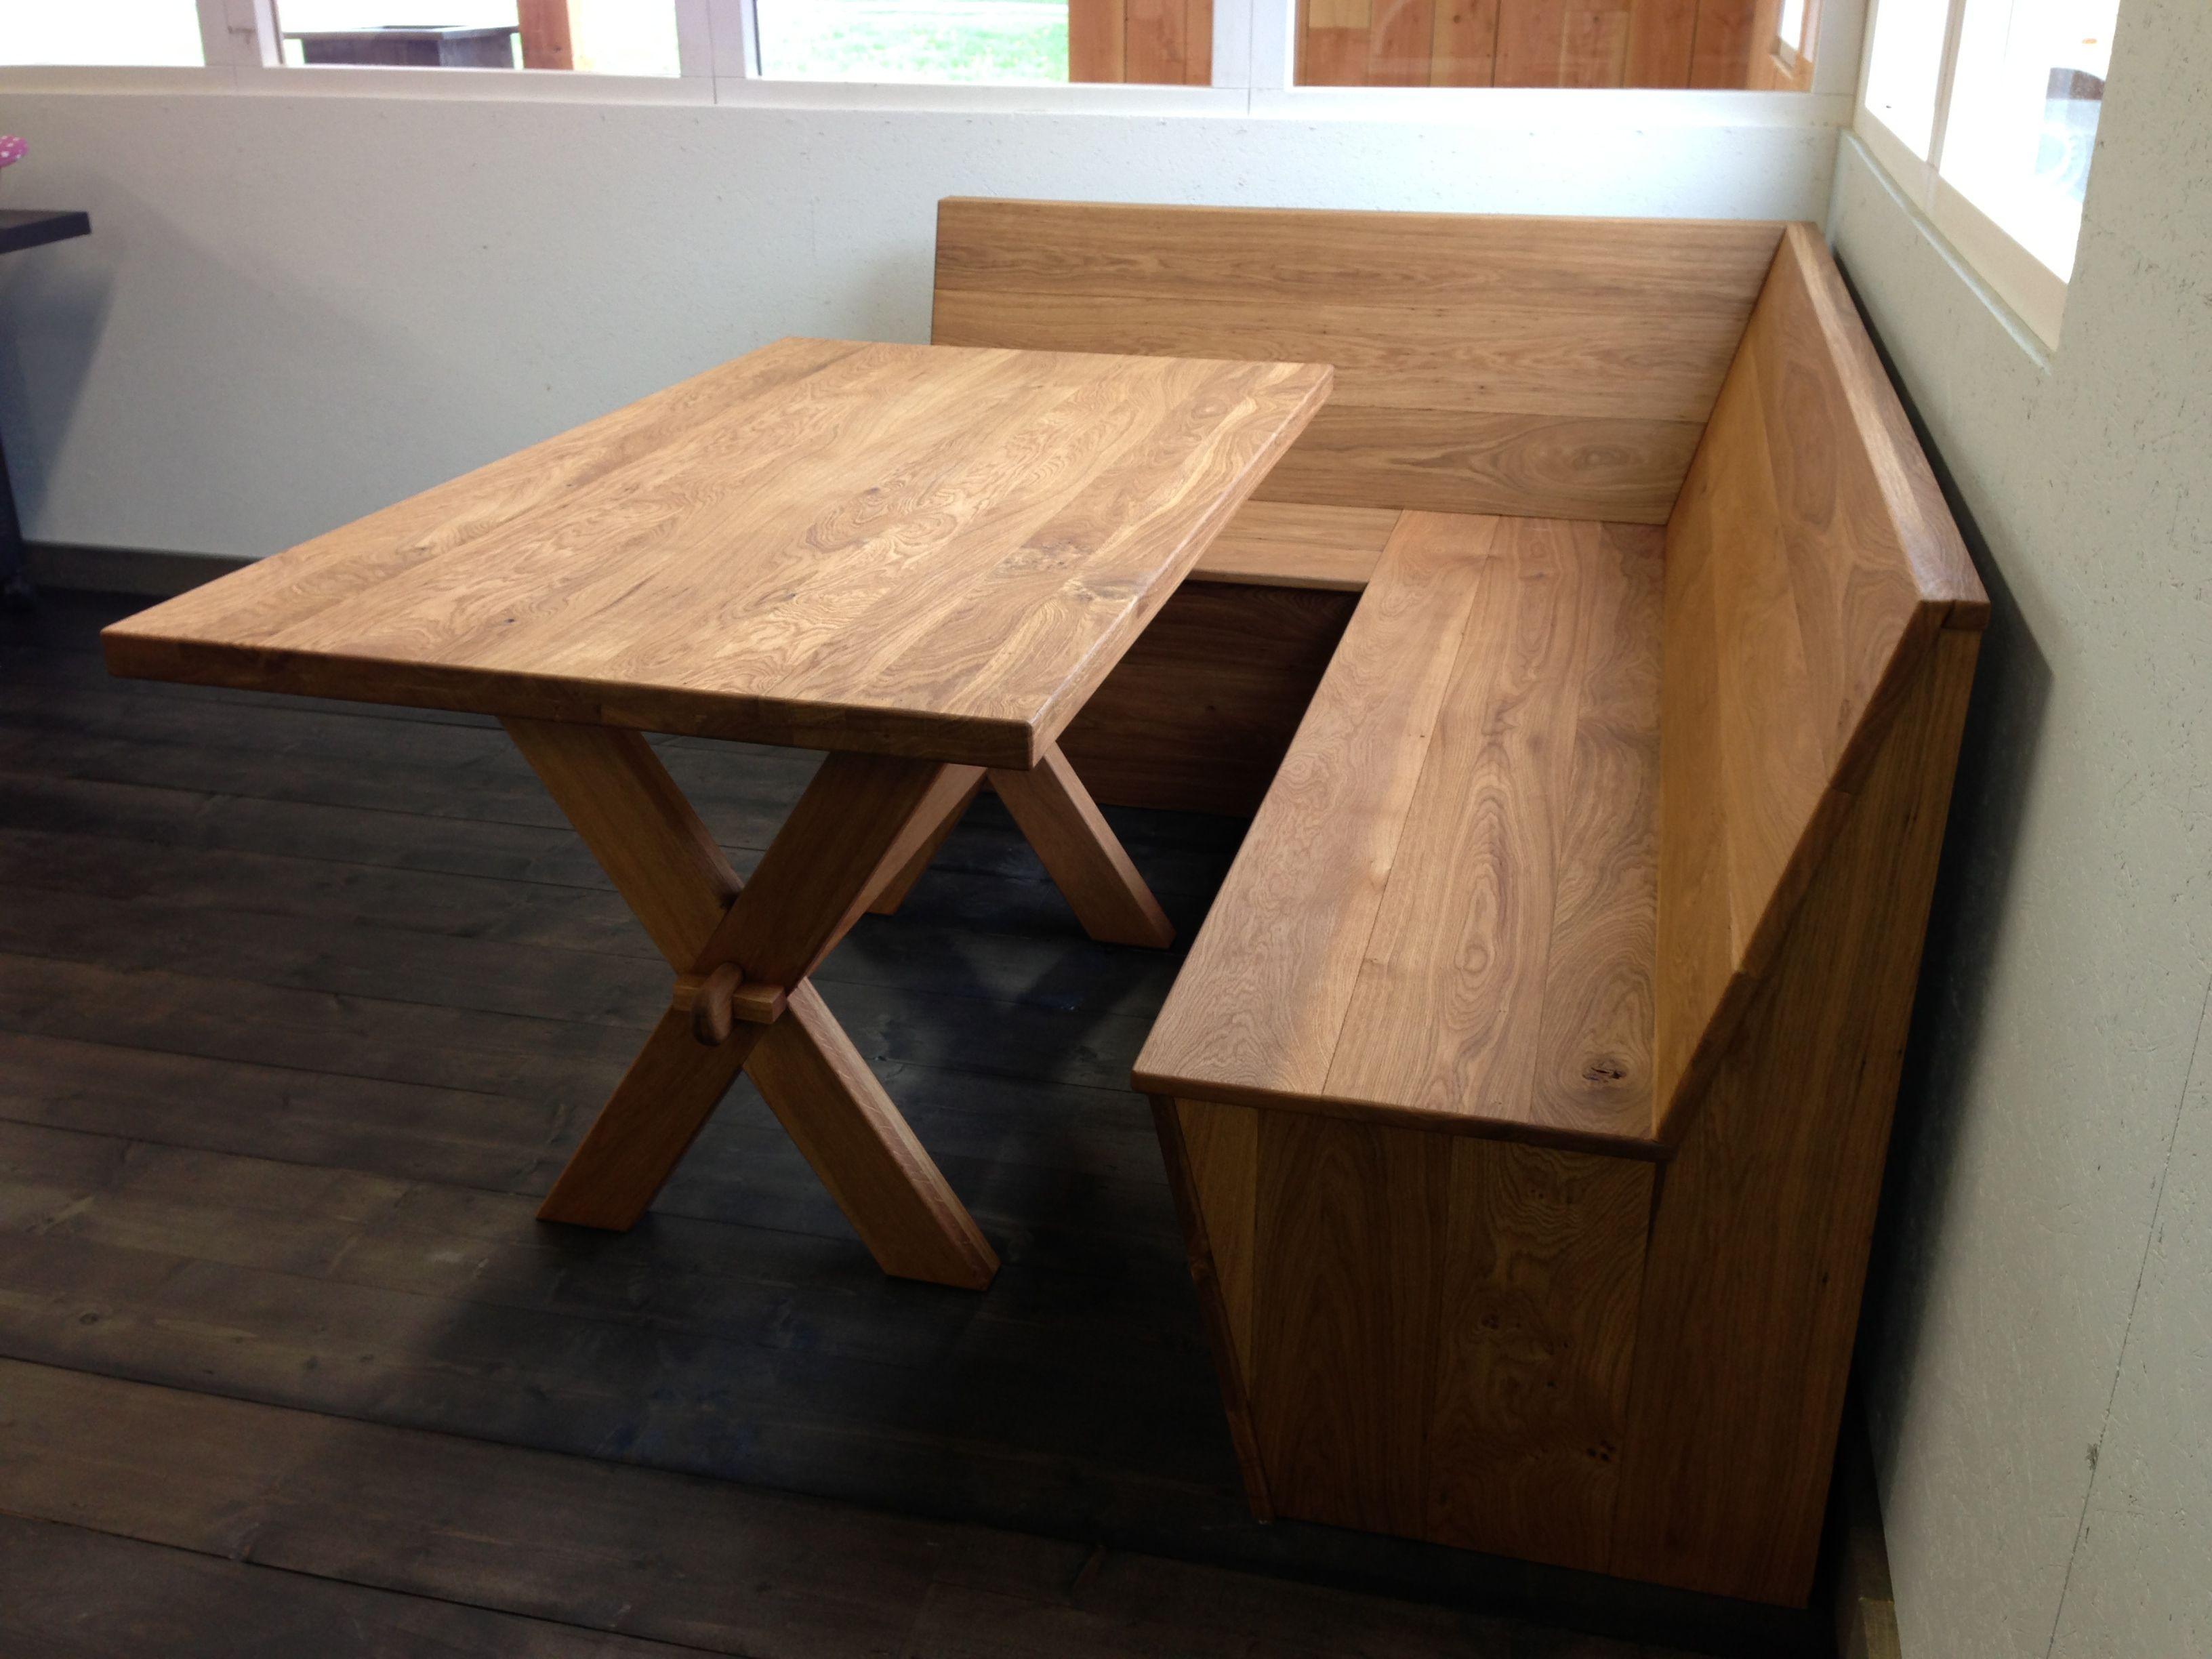 Eiken hoekbank en Eiken tafel - Interieur woning   Pinterest - Eiken ...